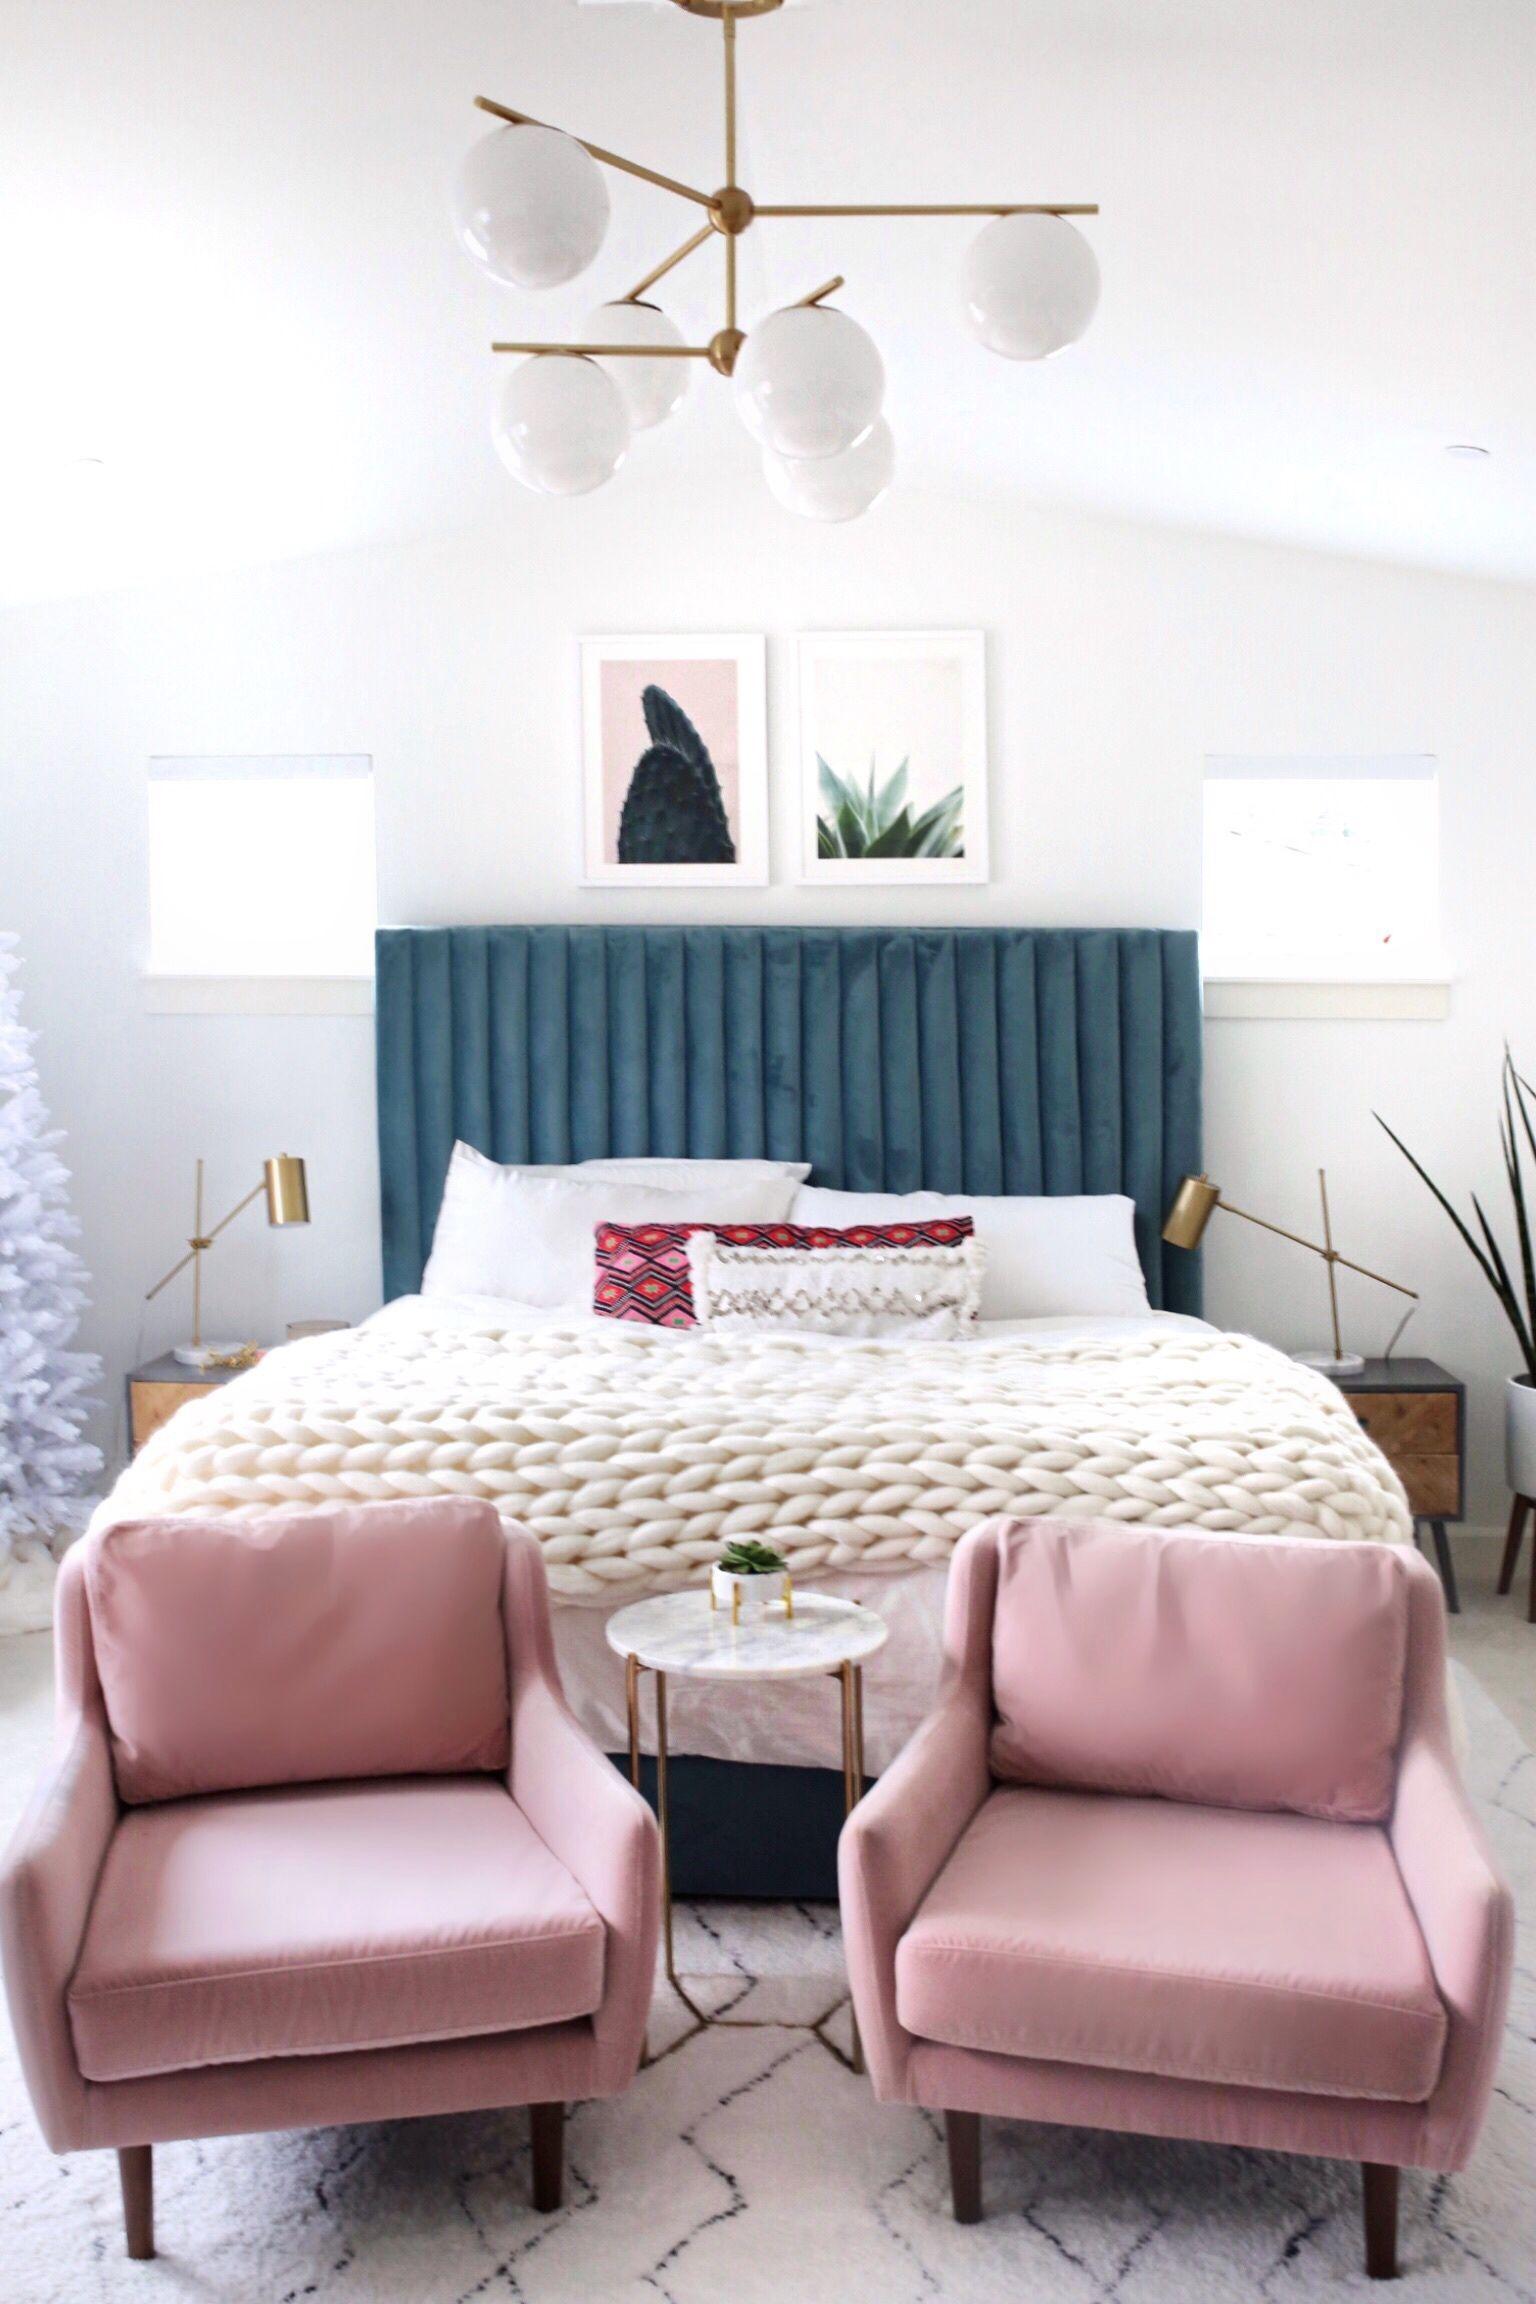 Best White Paint Colors for Interiors | Pinterest | White paint ...